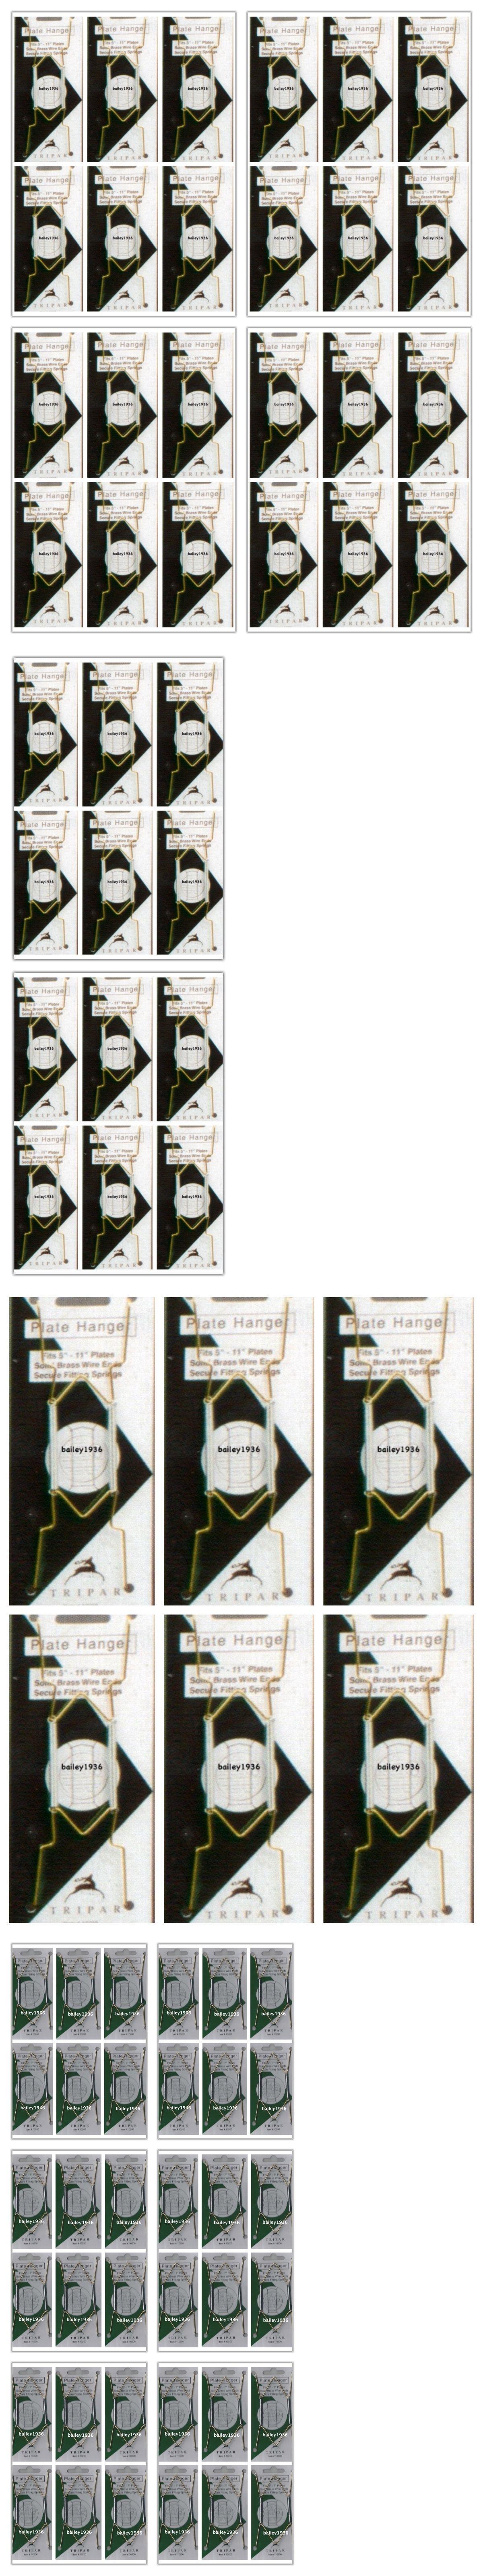 Plate Racks and Hangers 31588 (24) Plate Hangers 5 - 11 Expandable Added  sc 1 st  Pinterest & Plate Racks and Hangers 31588: (24) Plate Hangers 5 - 11 Expandable ...